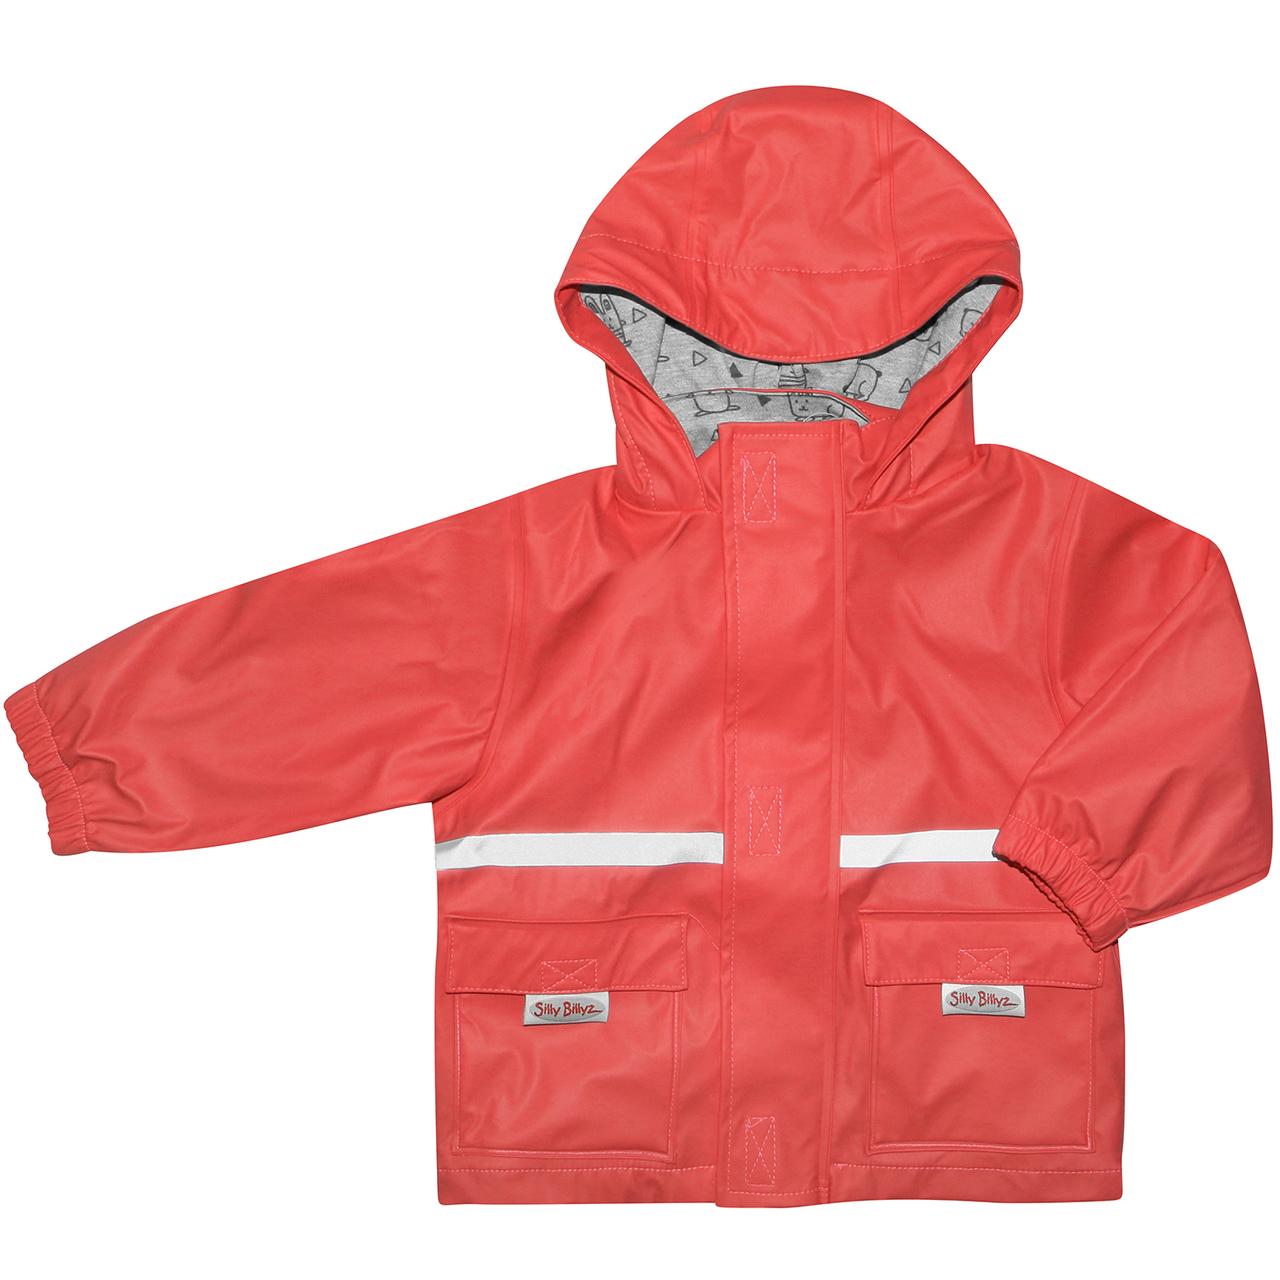 Silly Billyz Waterproof Jacket - Red (3-4 Yrs) image